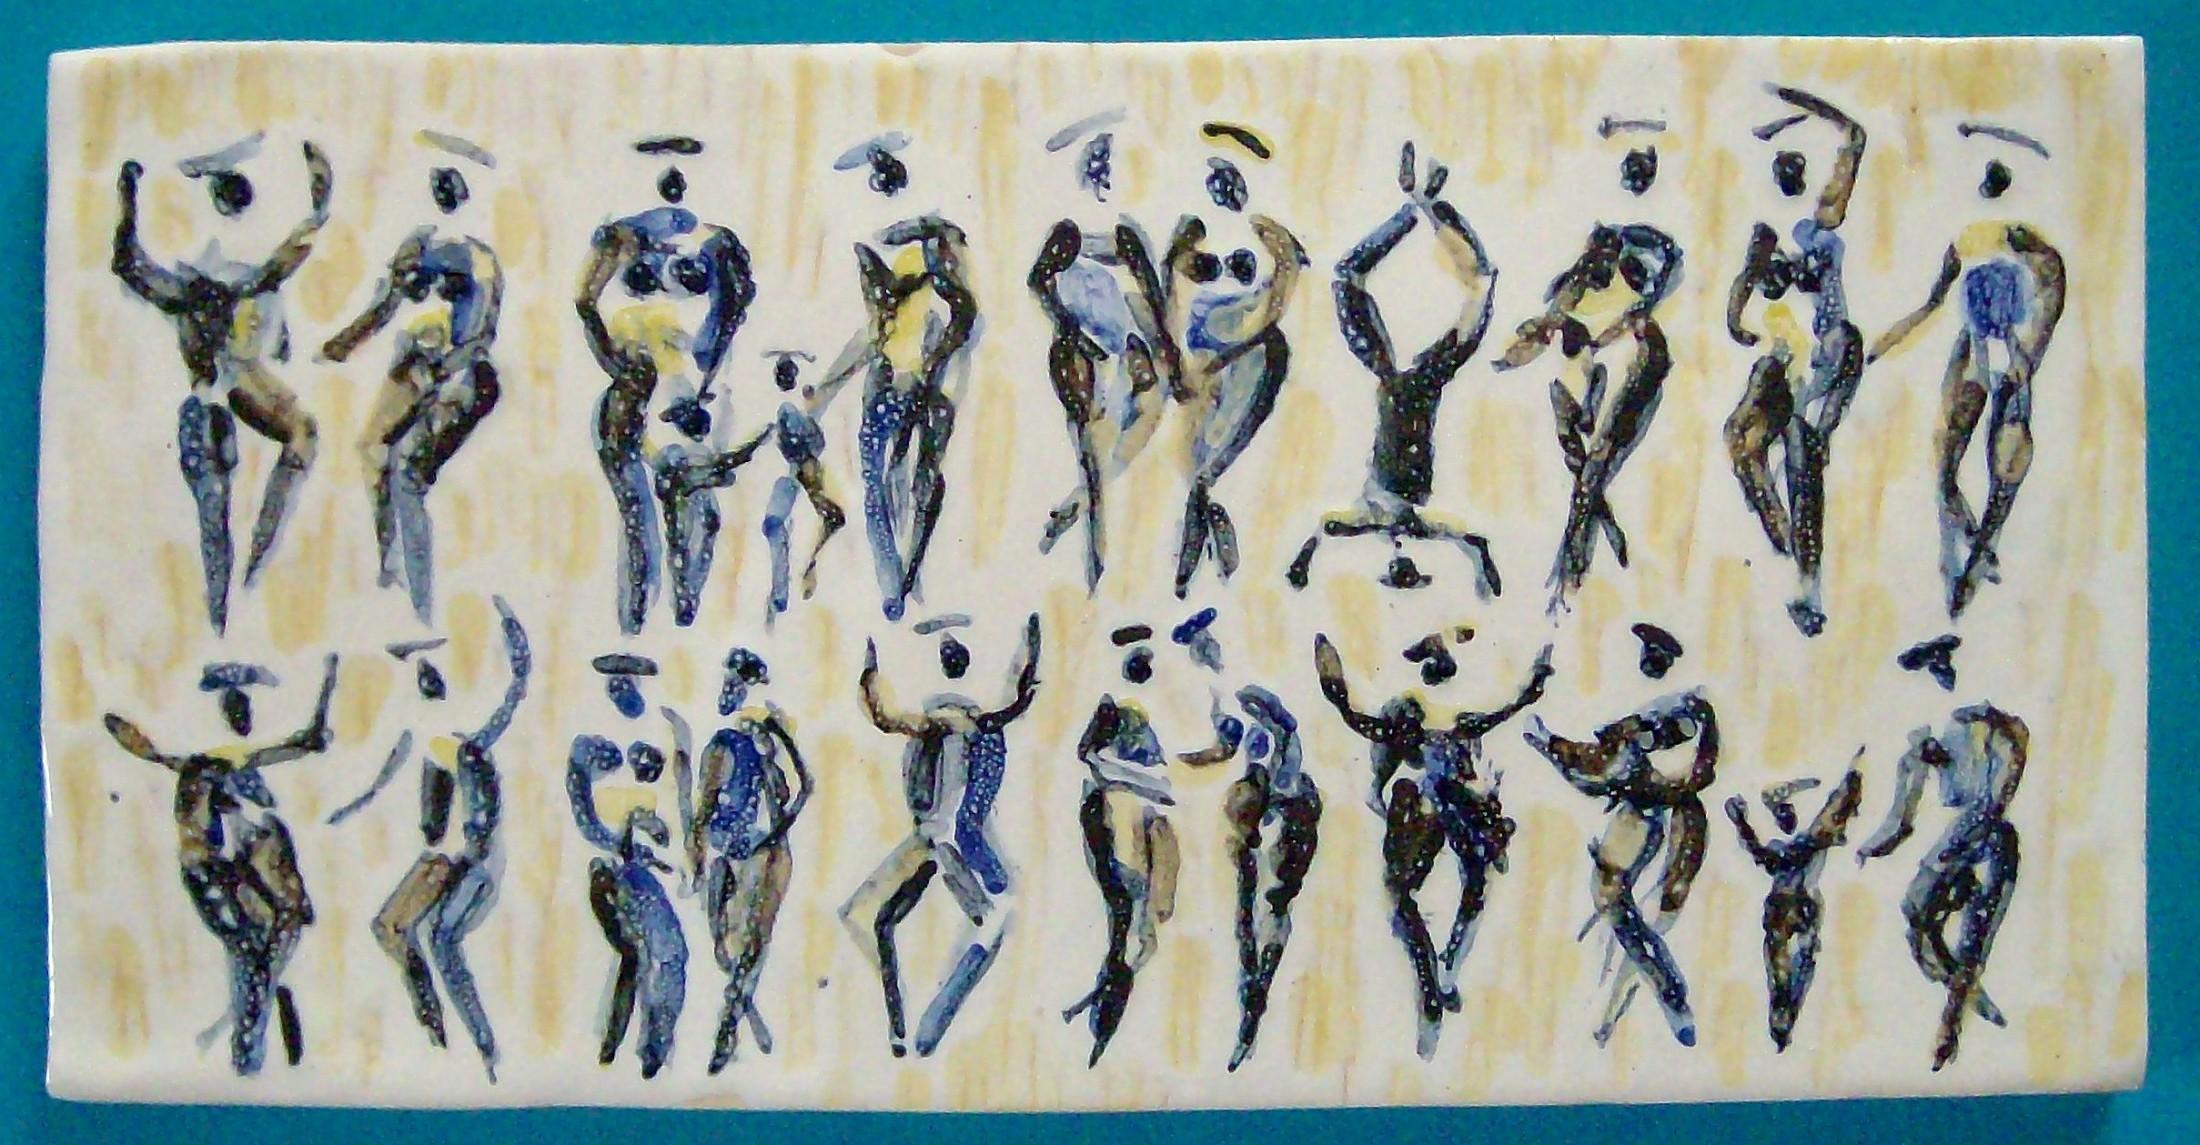 Figurenfries, 14 x 28 cm, Keramik, 1999